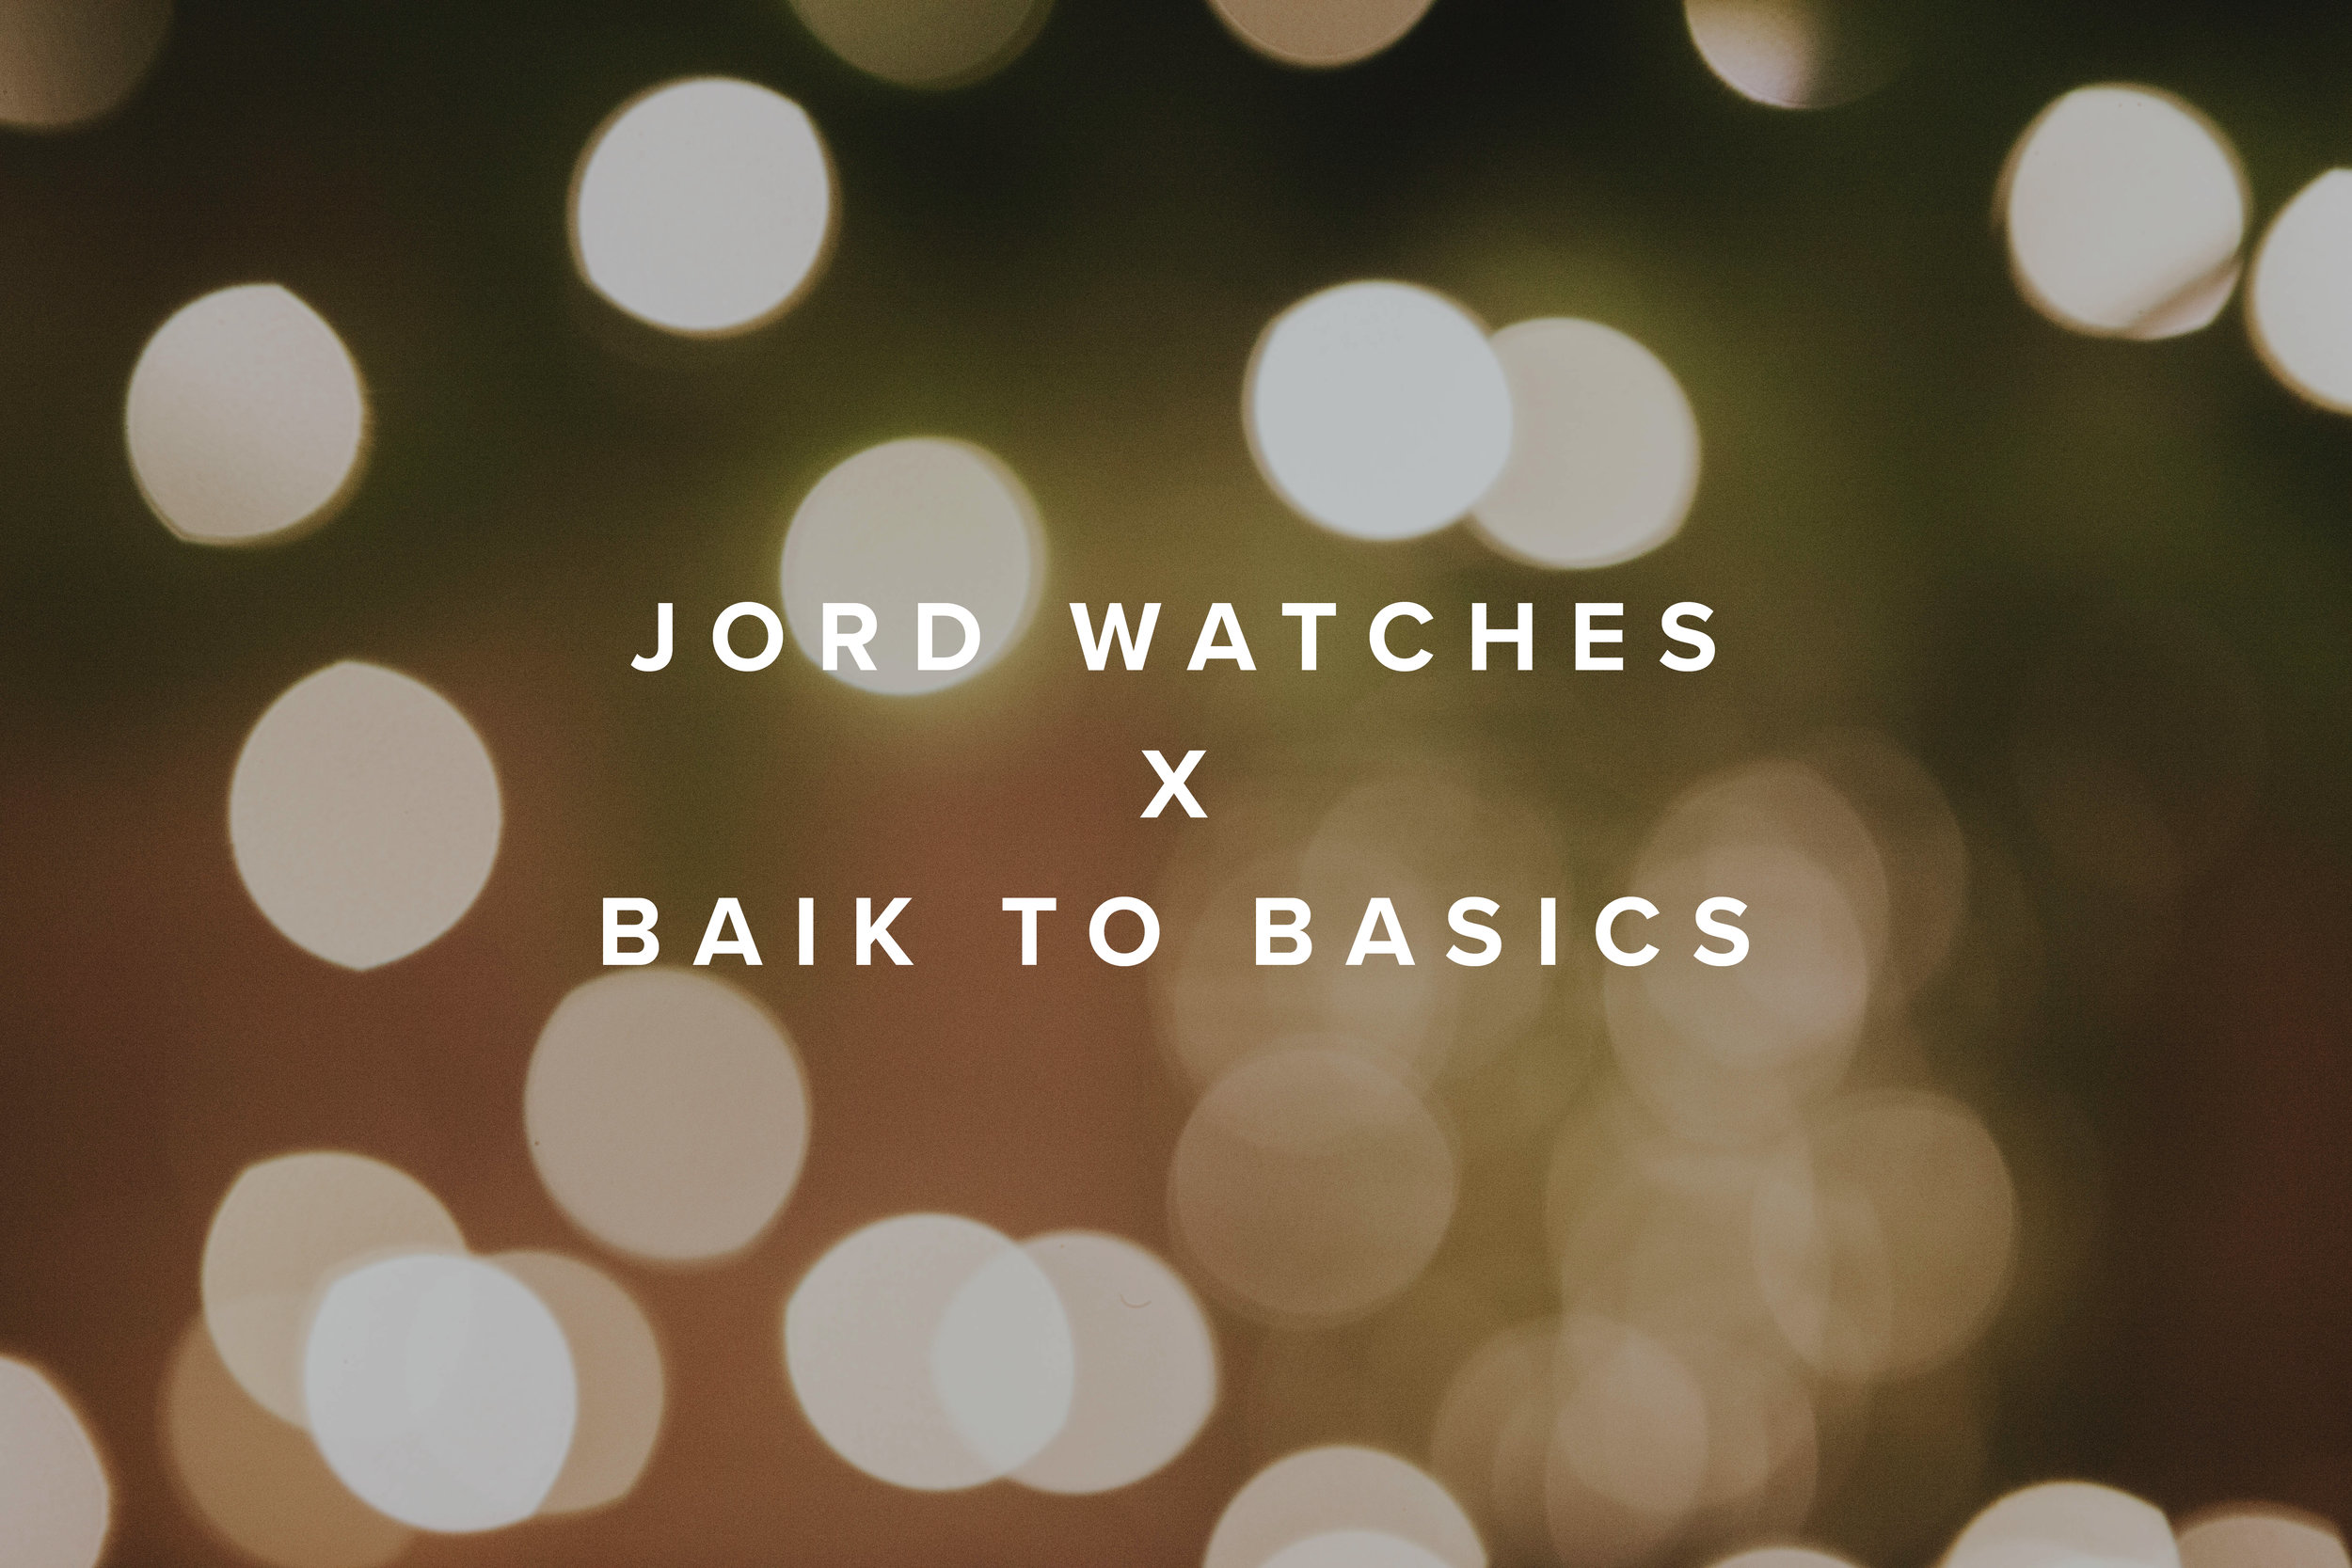 BAIK TO BASICS X JORD WATCH COVER.jpg